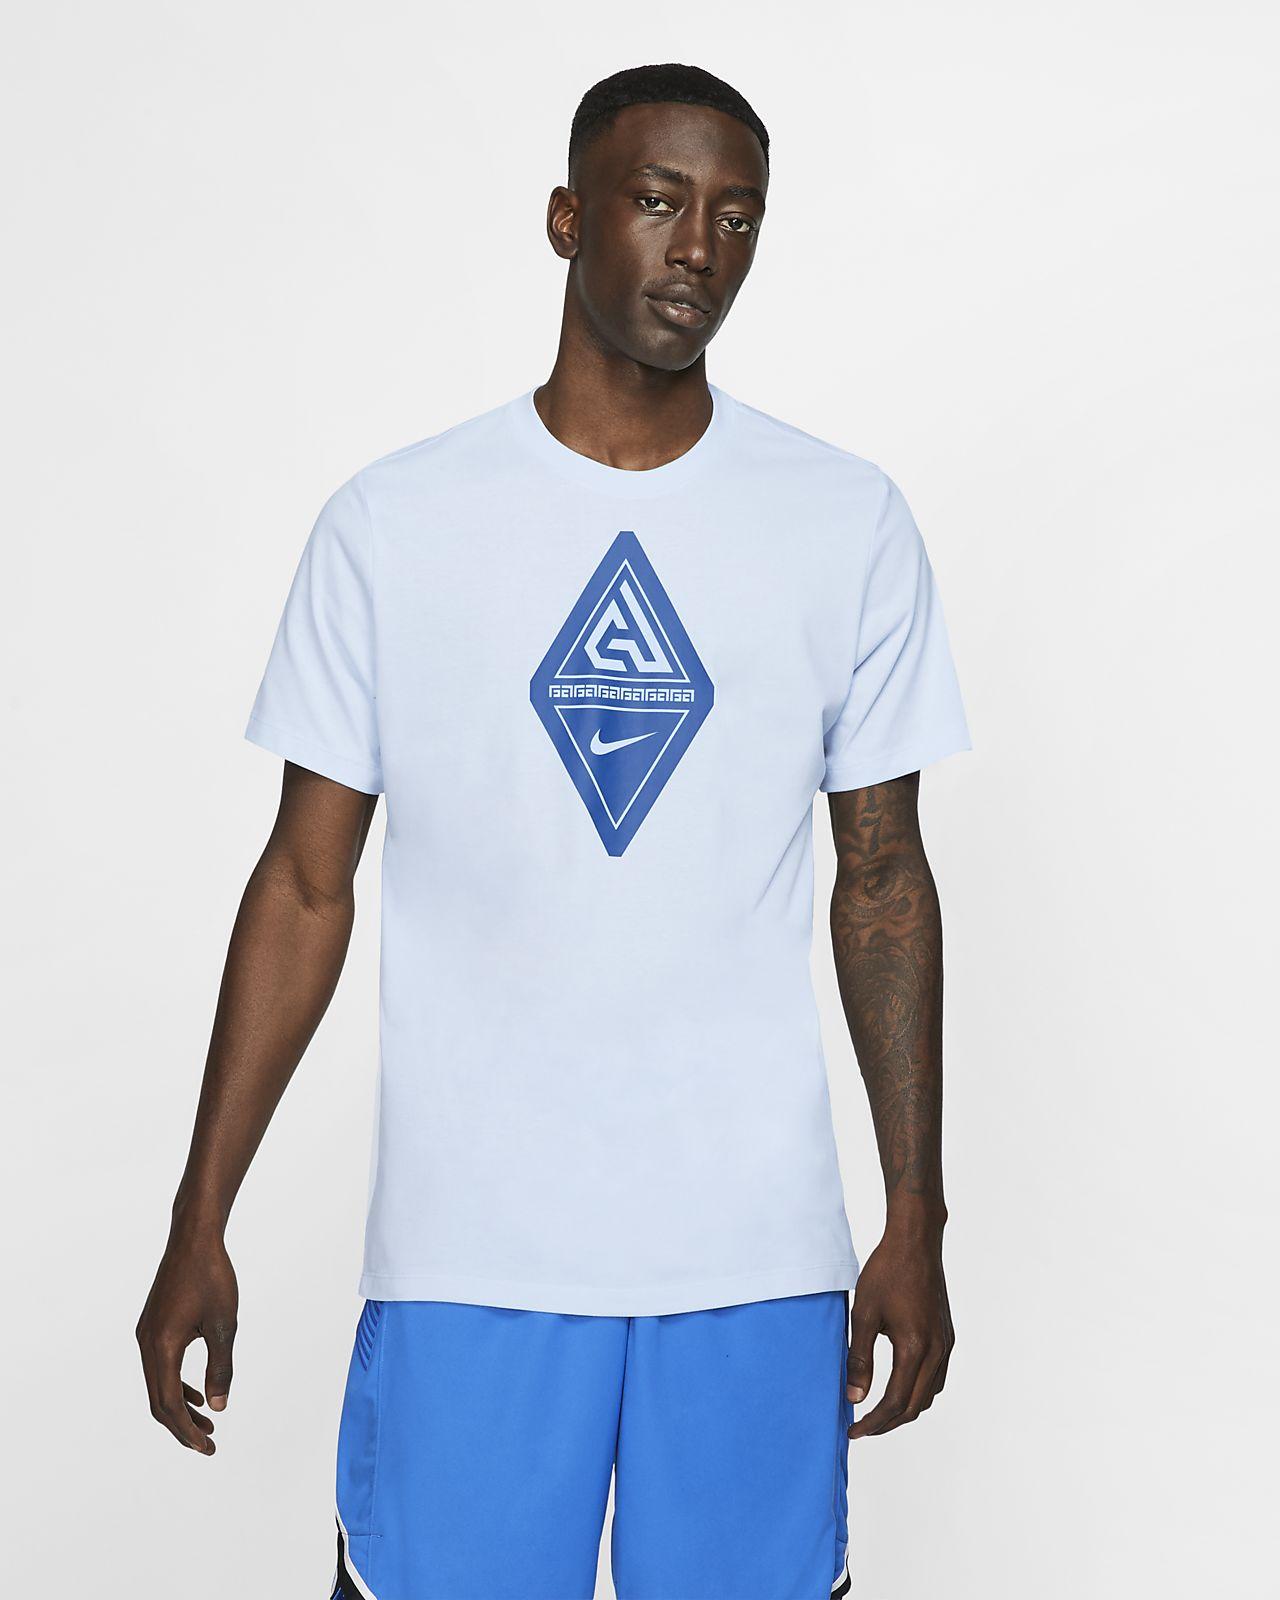 Pánské basketbalové tričko Giannis Nike Dri-FIT s logem